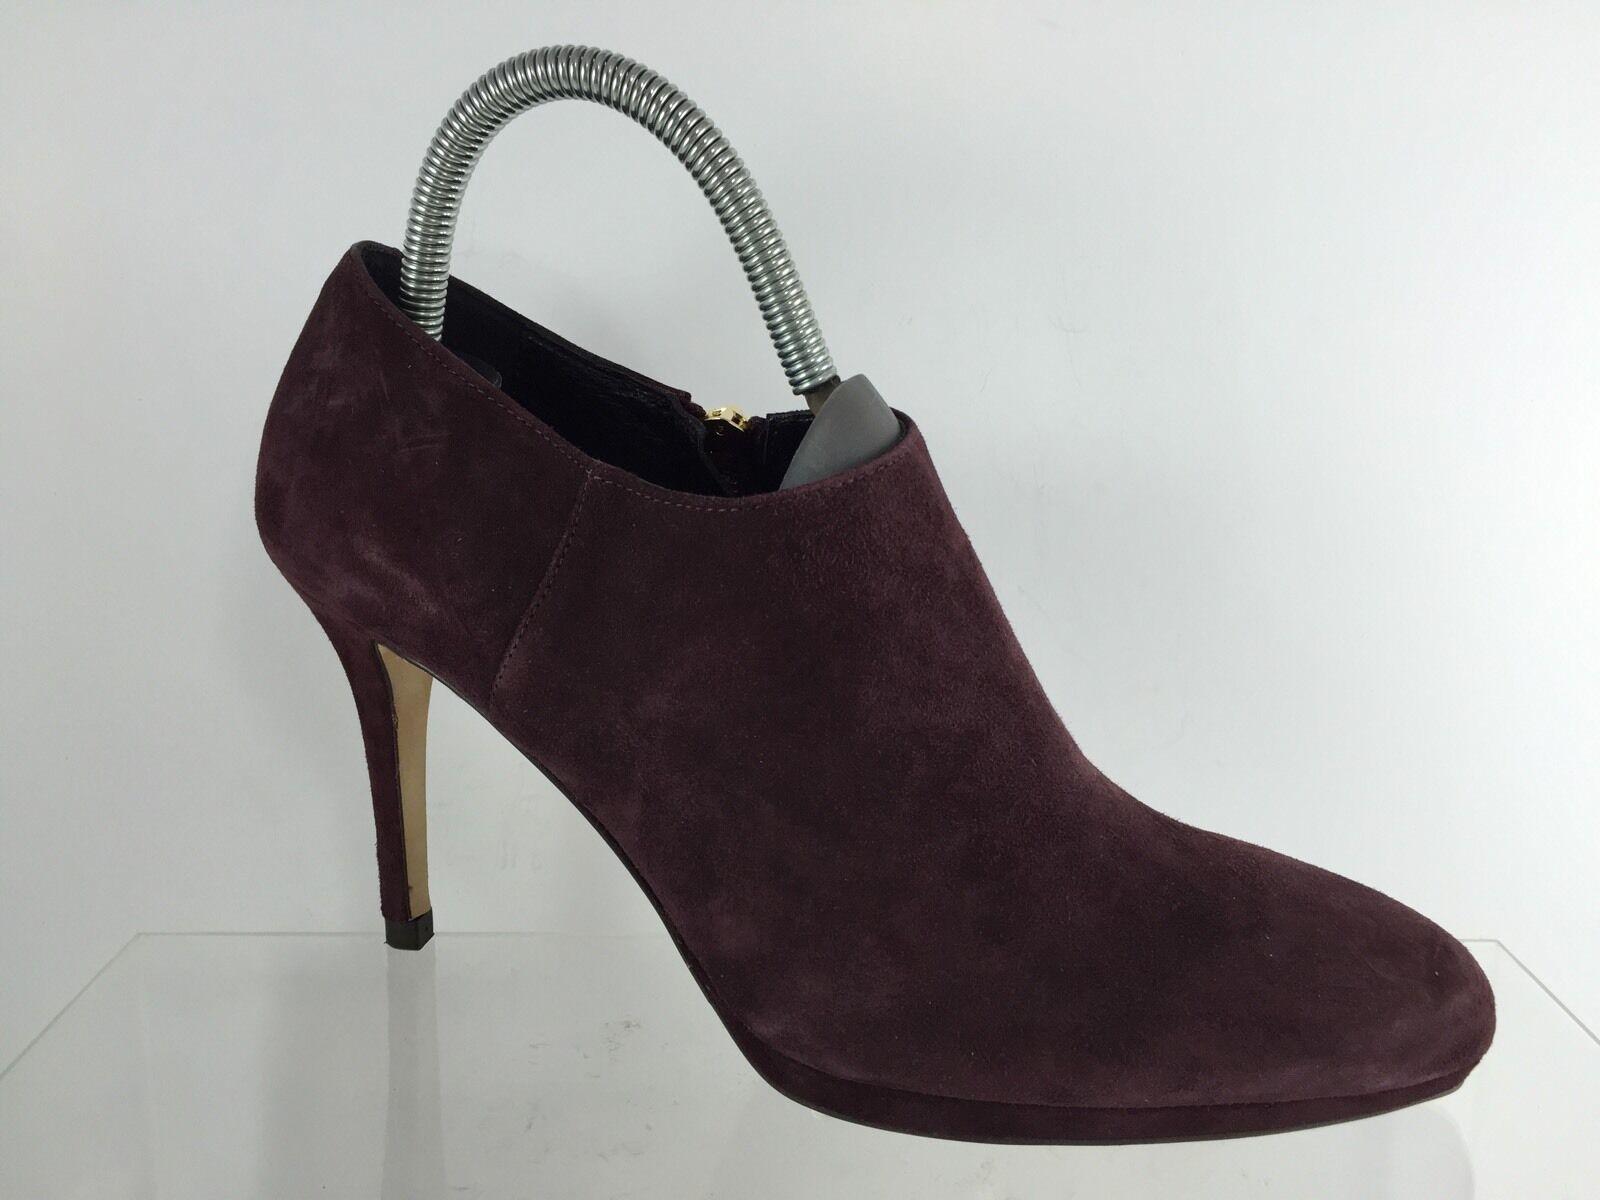 LK Bennett Women's Dark Maroon Leather Ankle Boots 40.5